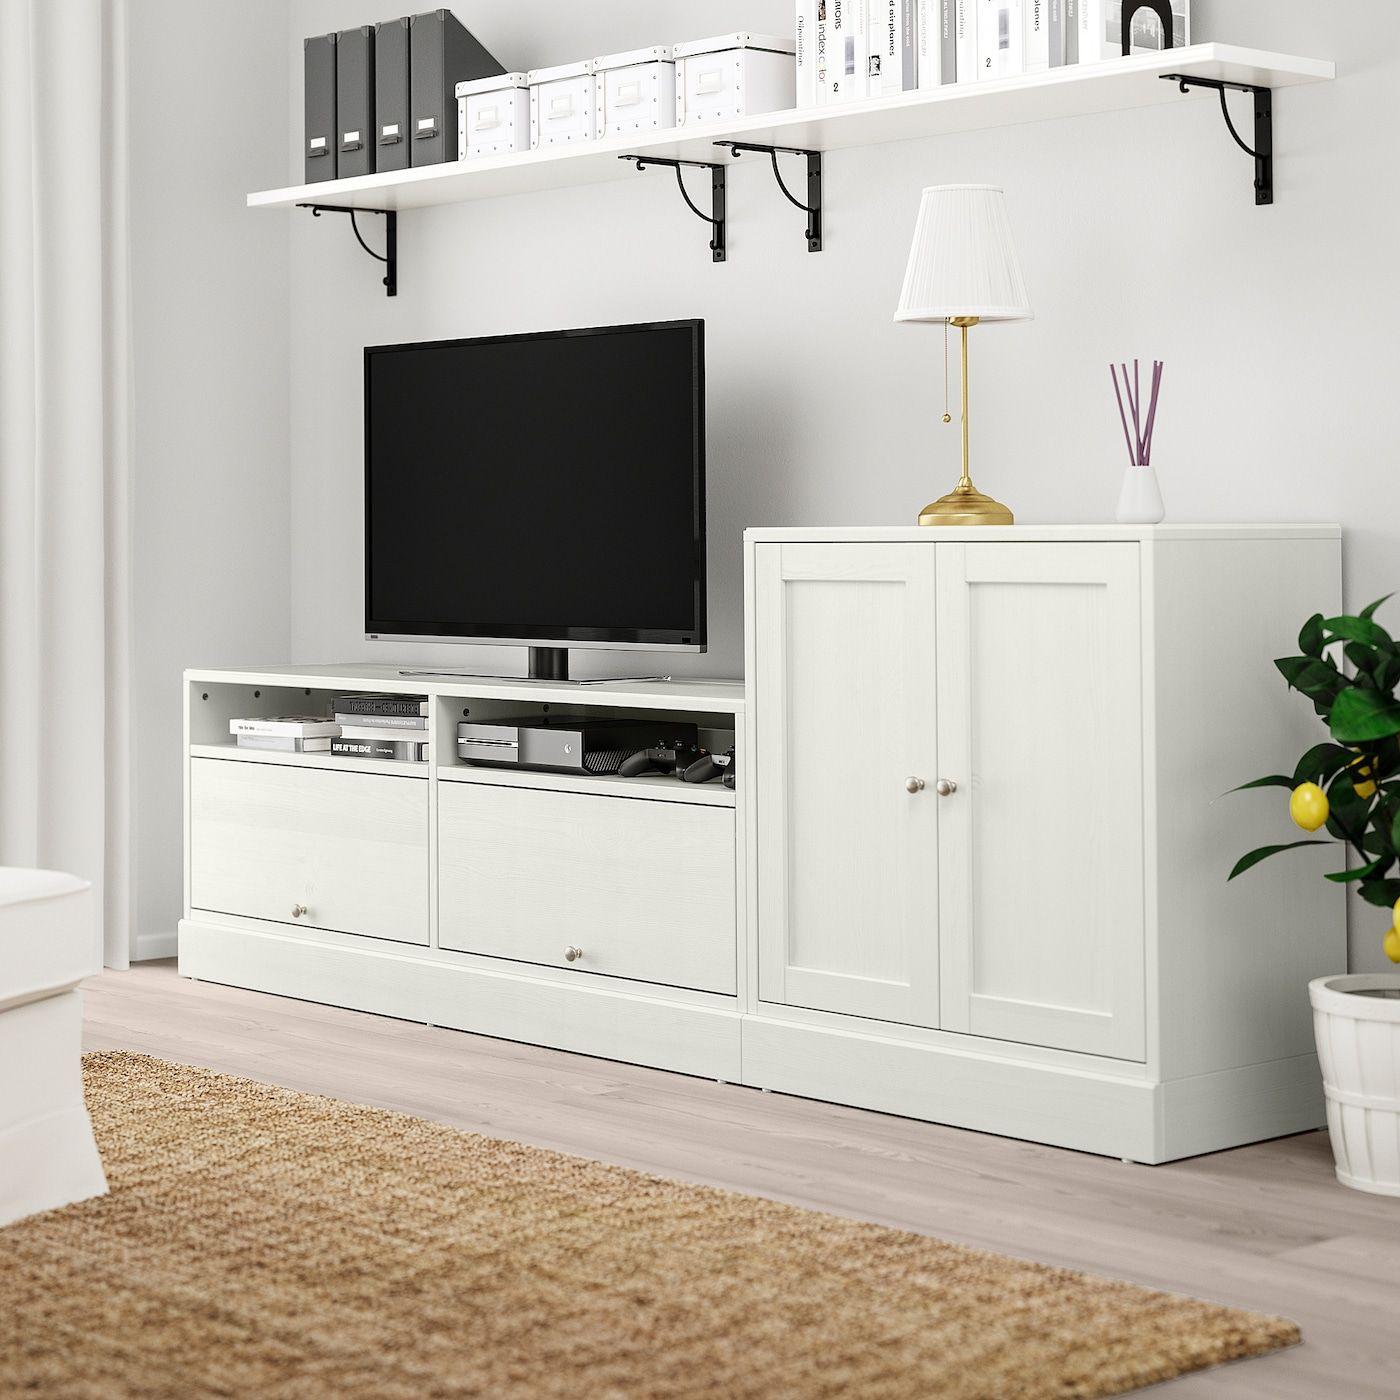 Ikea Havsta Tv Storage Combination Muebles Para Tv Muebles Muebles Para Televisores